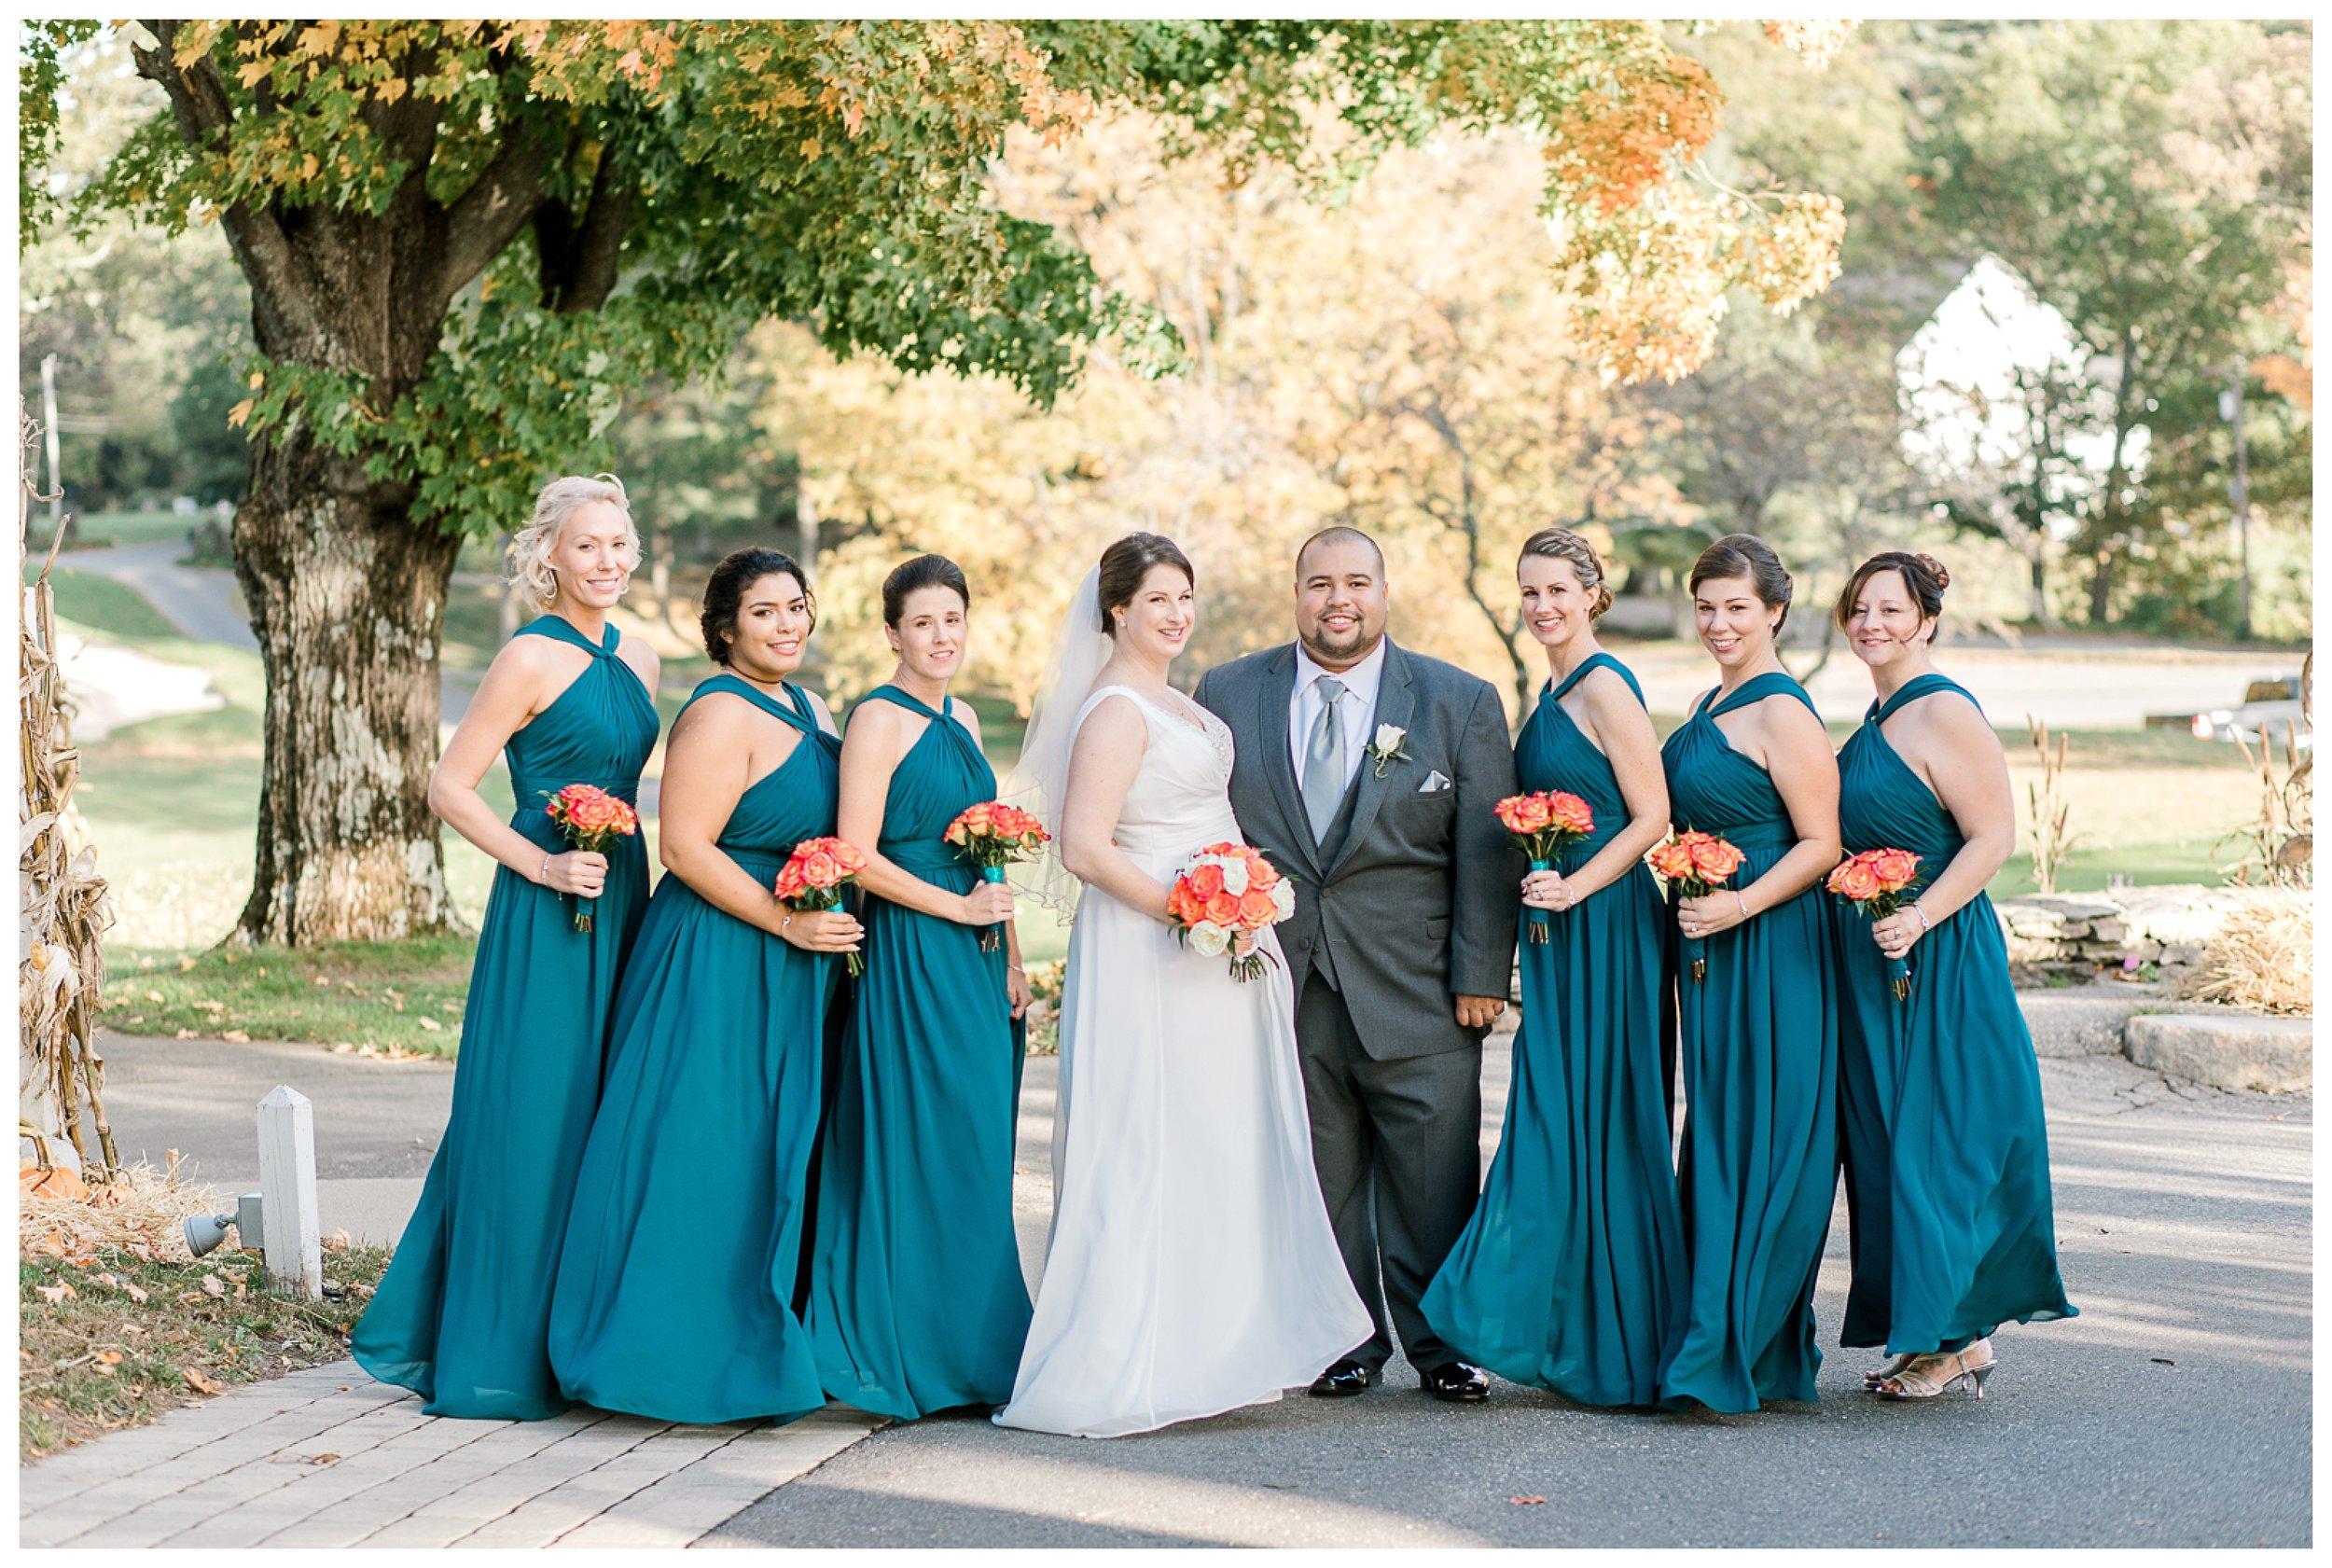 pleasant_valley_country_club_wedding_sutton_erica_pezente_photography (30).jpg